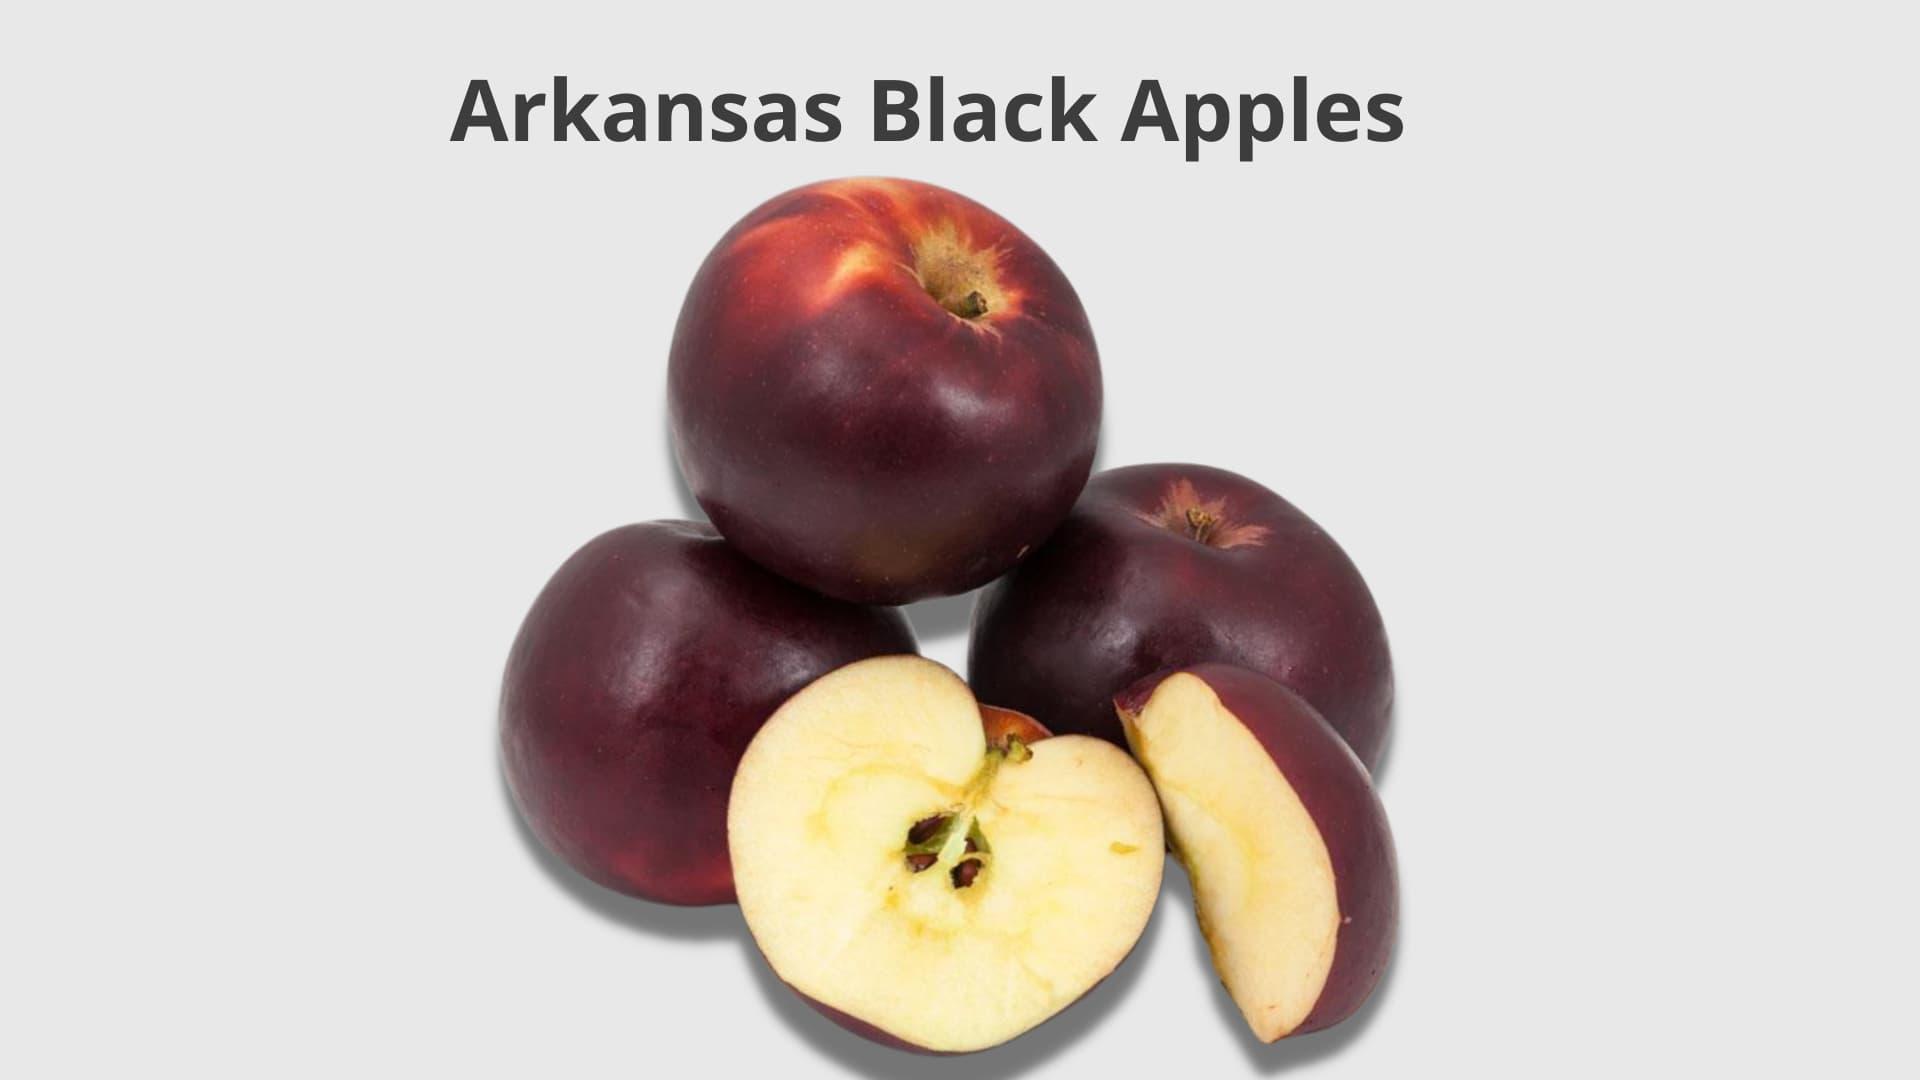 Arkansas Black Apples